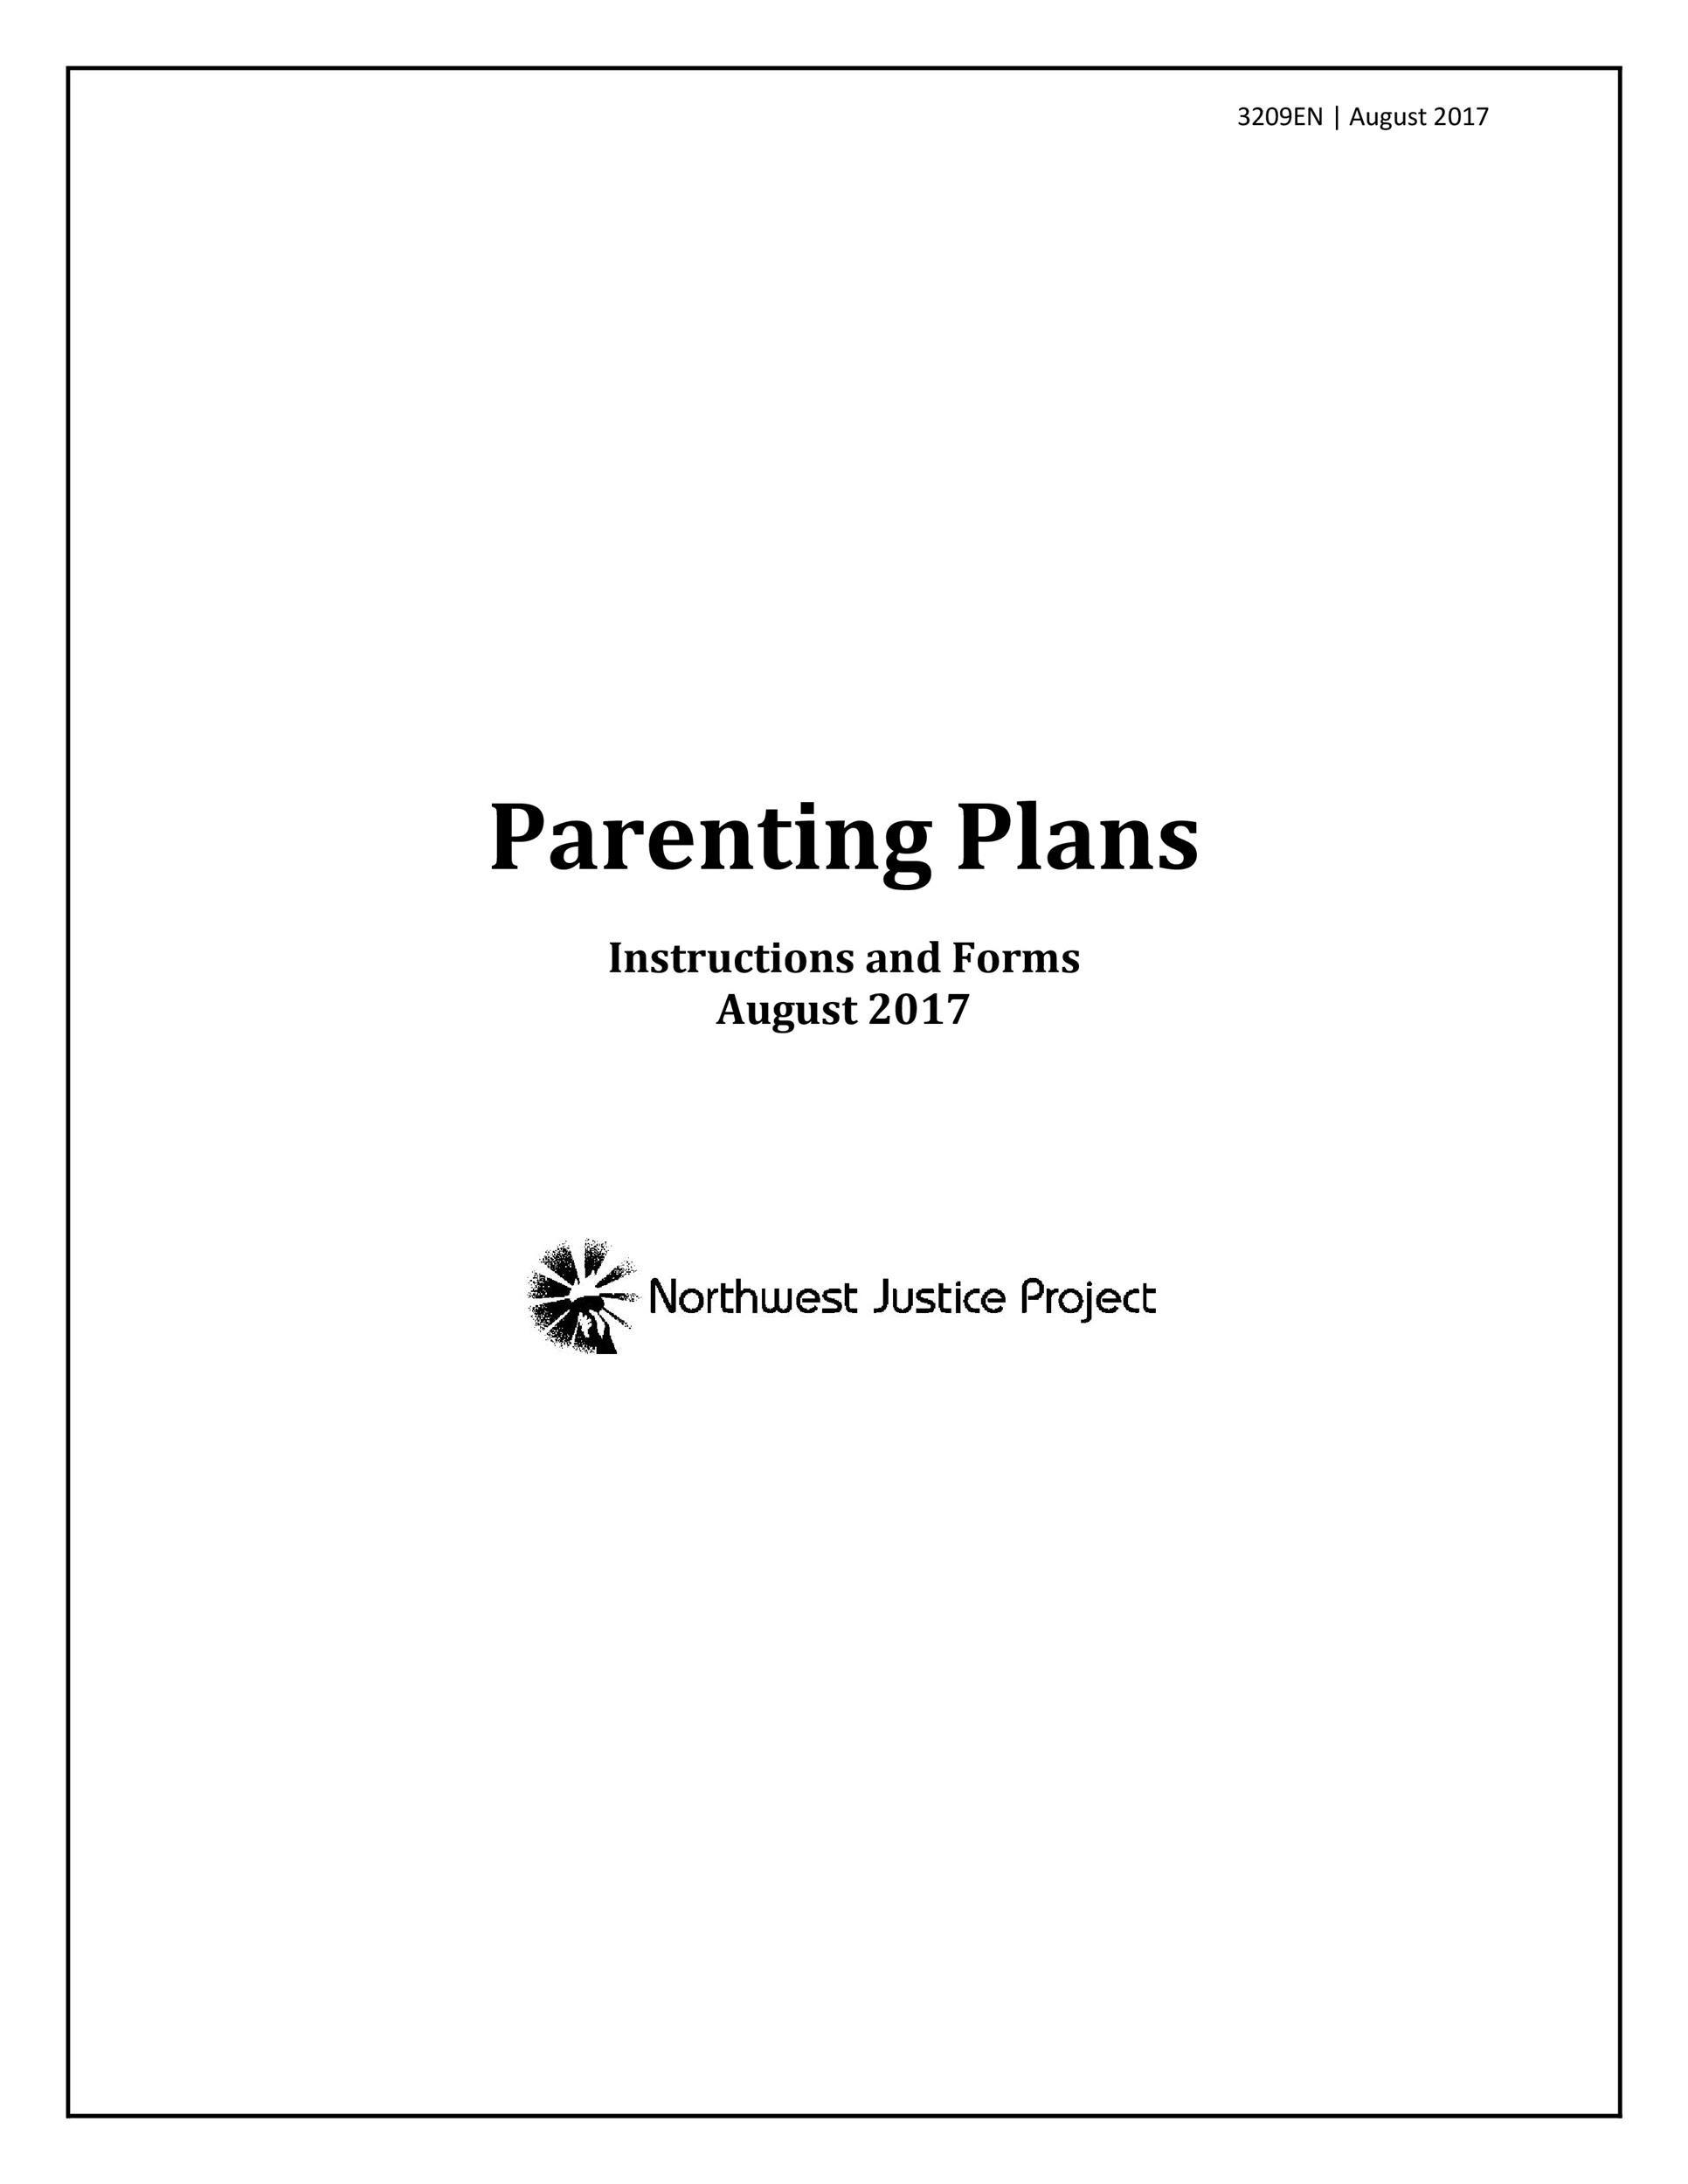 Free parenting plan template 42